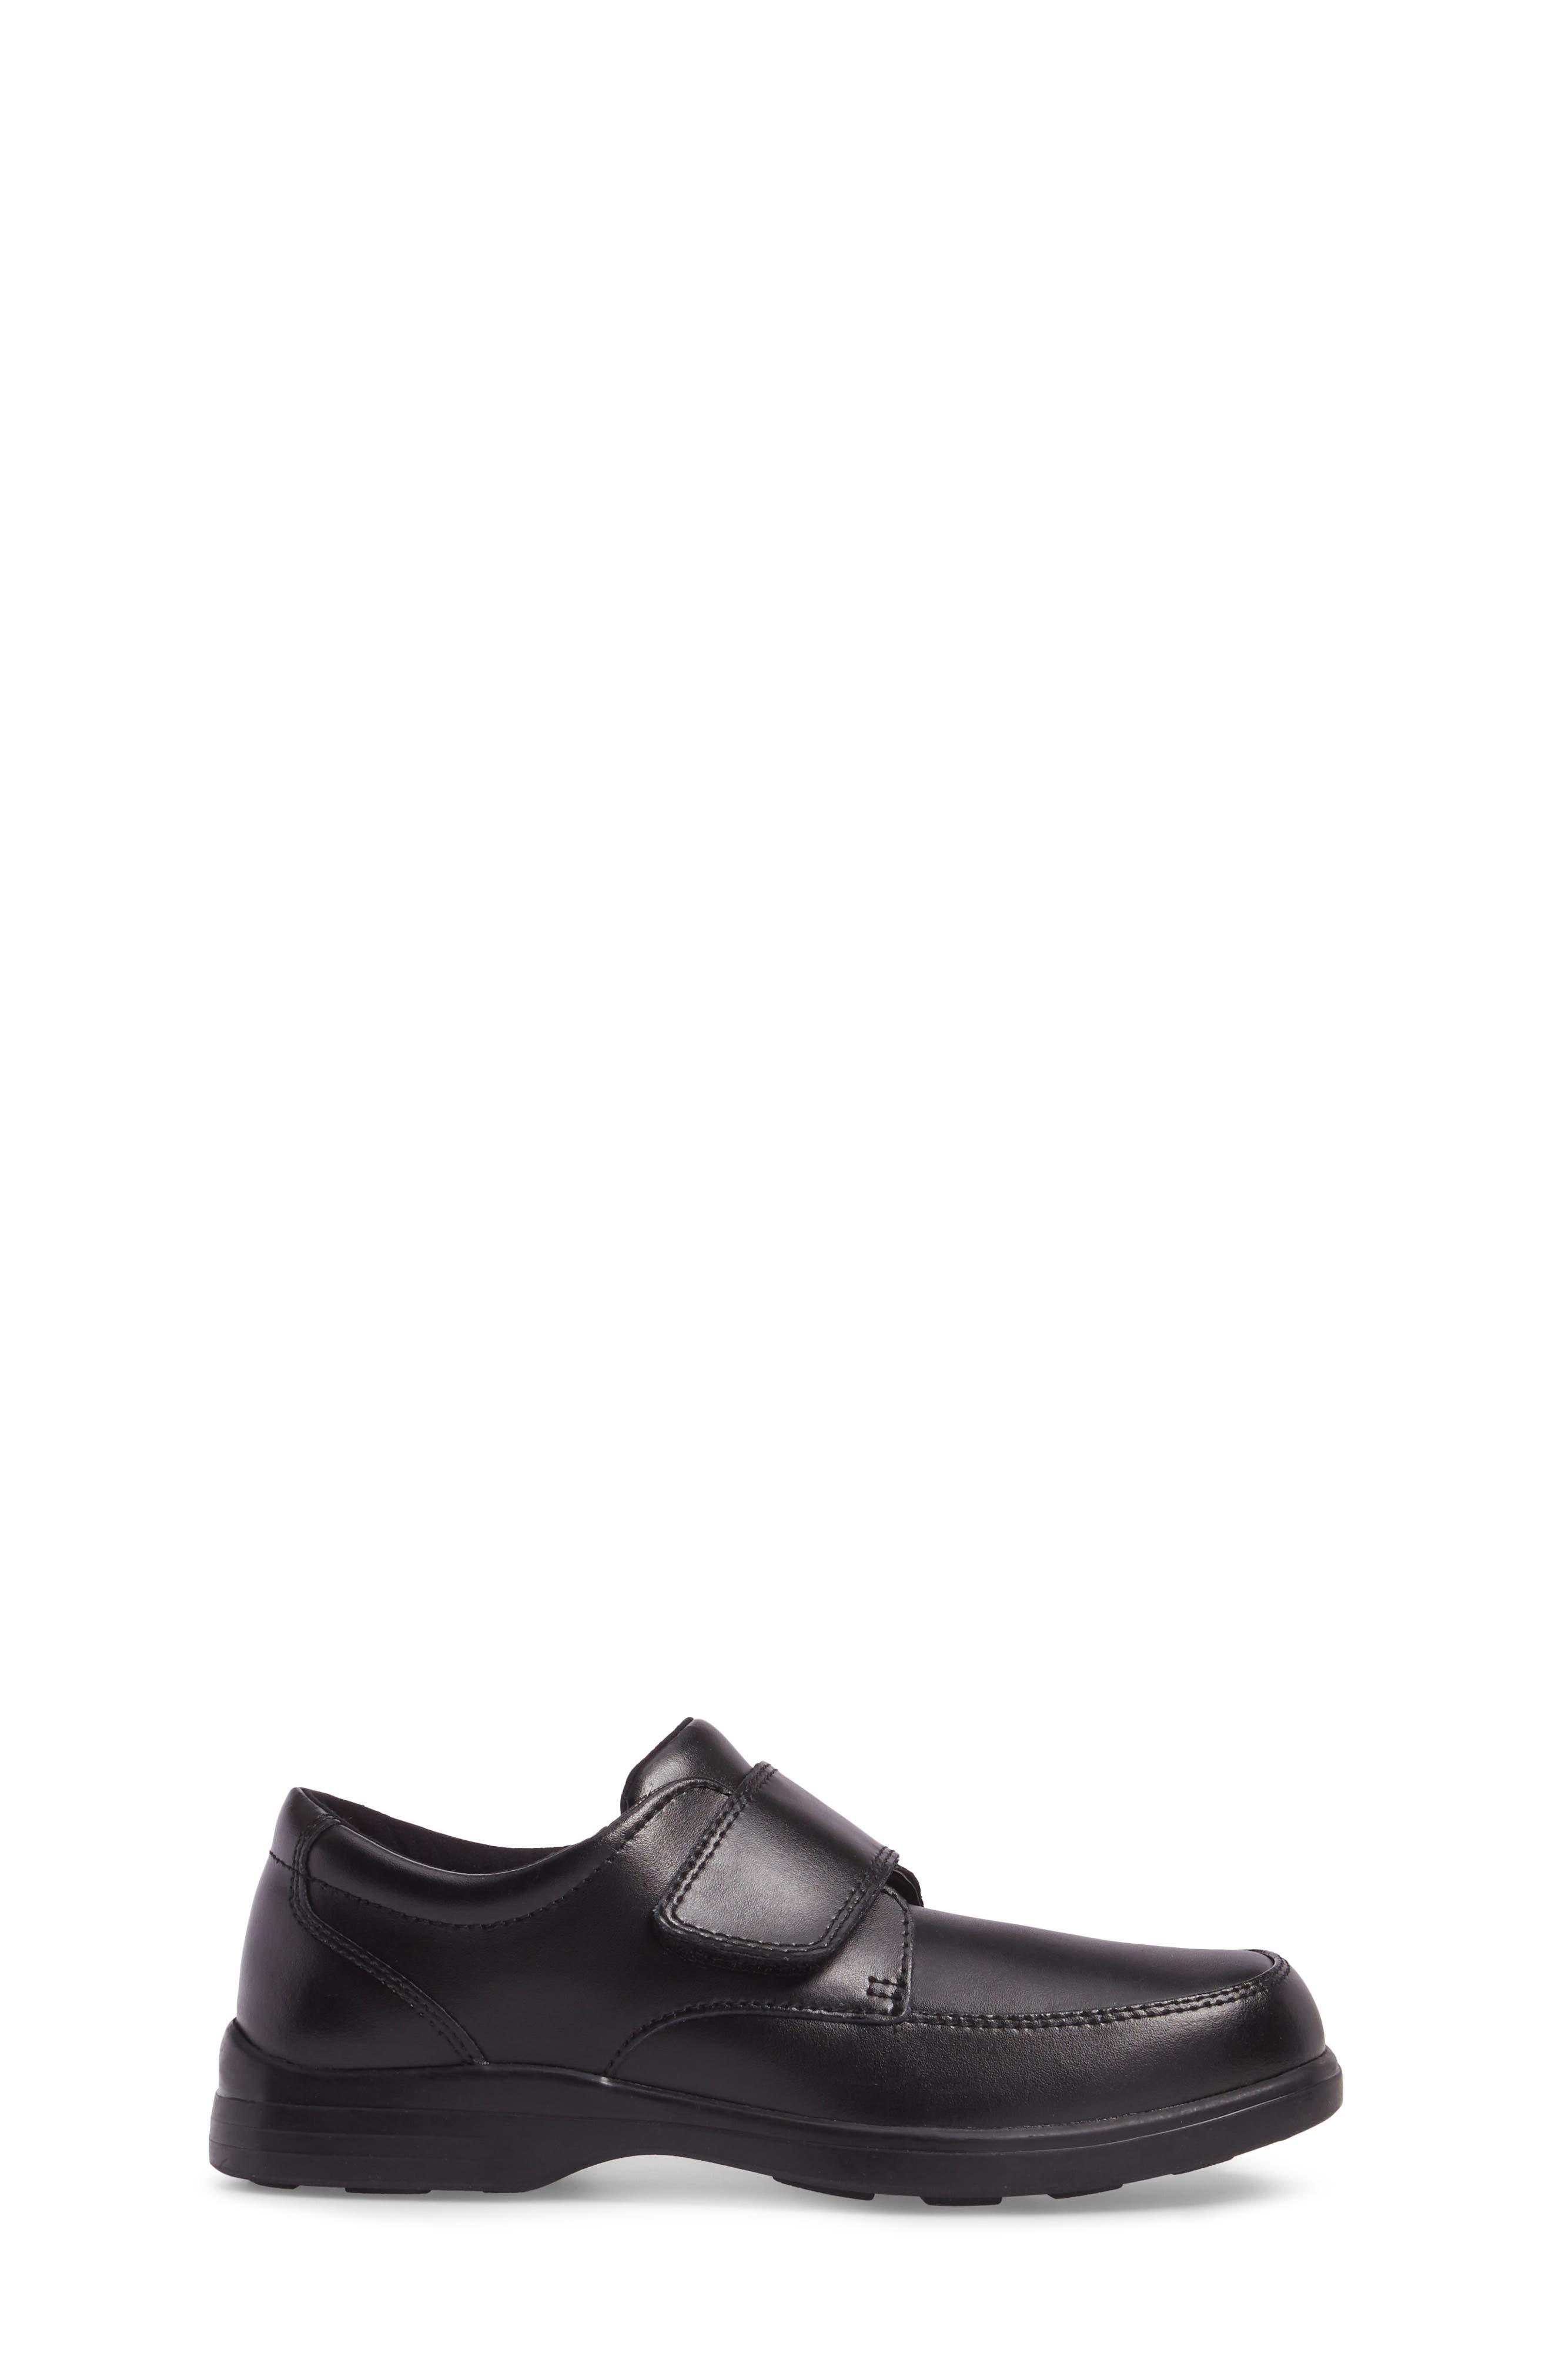 Hush Puppies Gavin Front Strap Dress Shoe,                             Alternate thumbnail 3, color,                             Black Leather